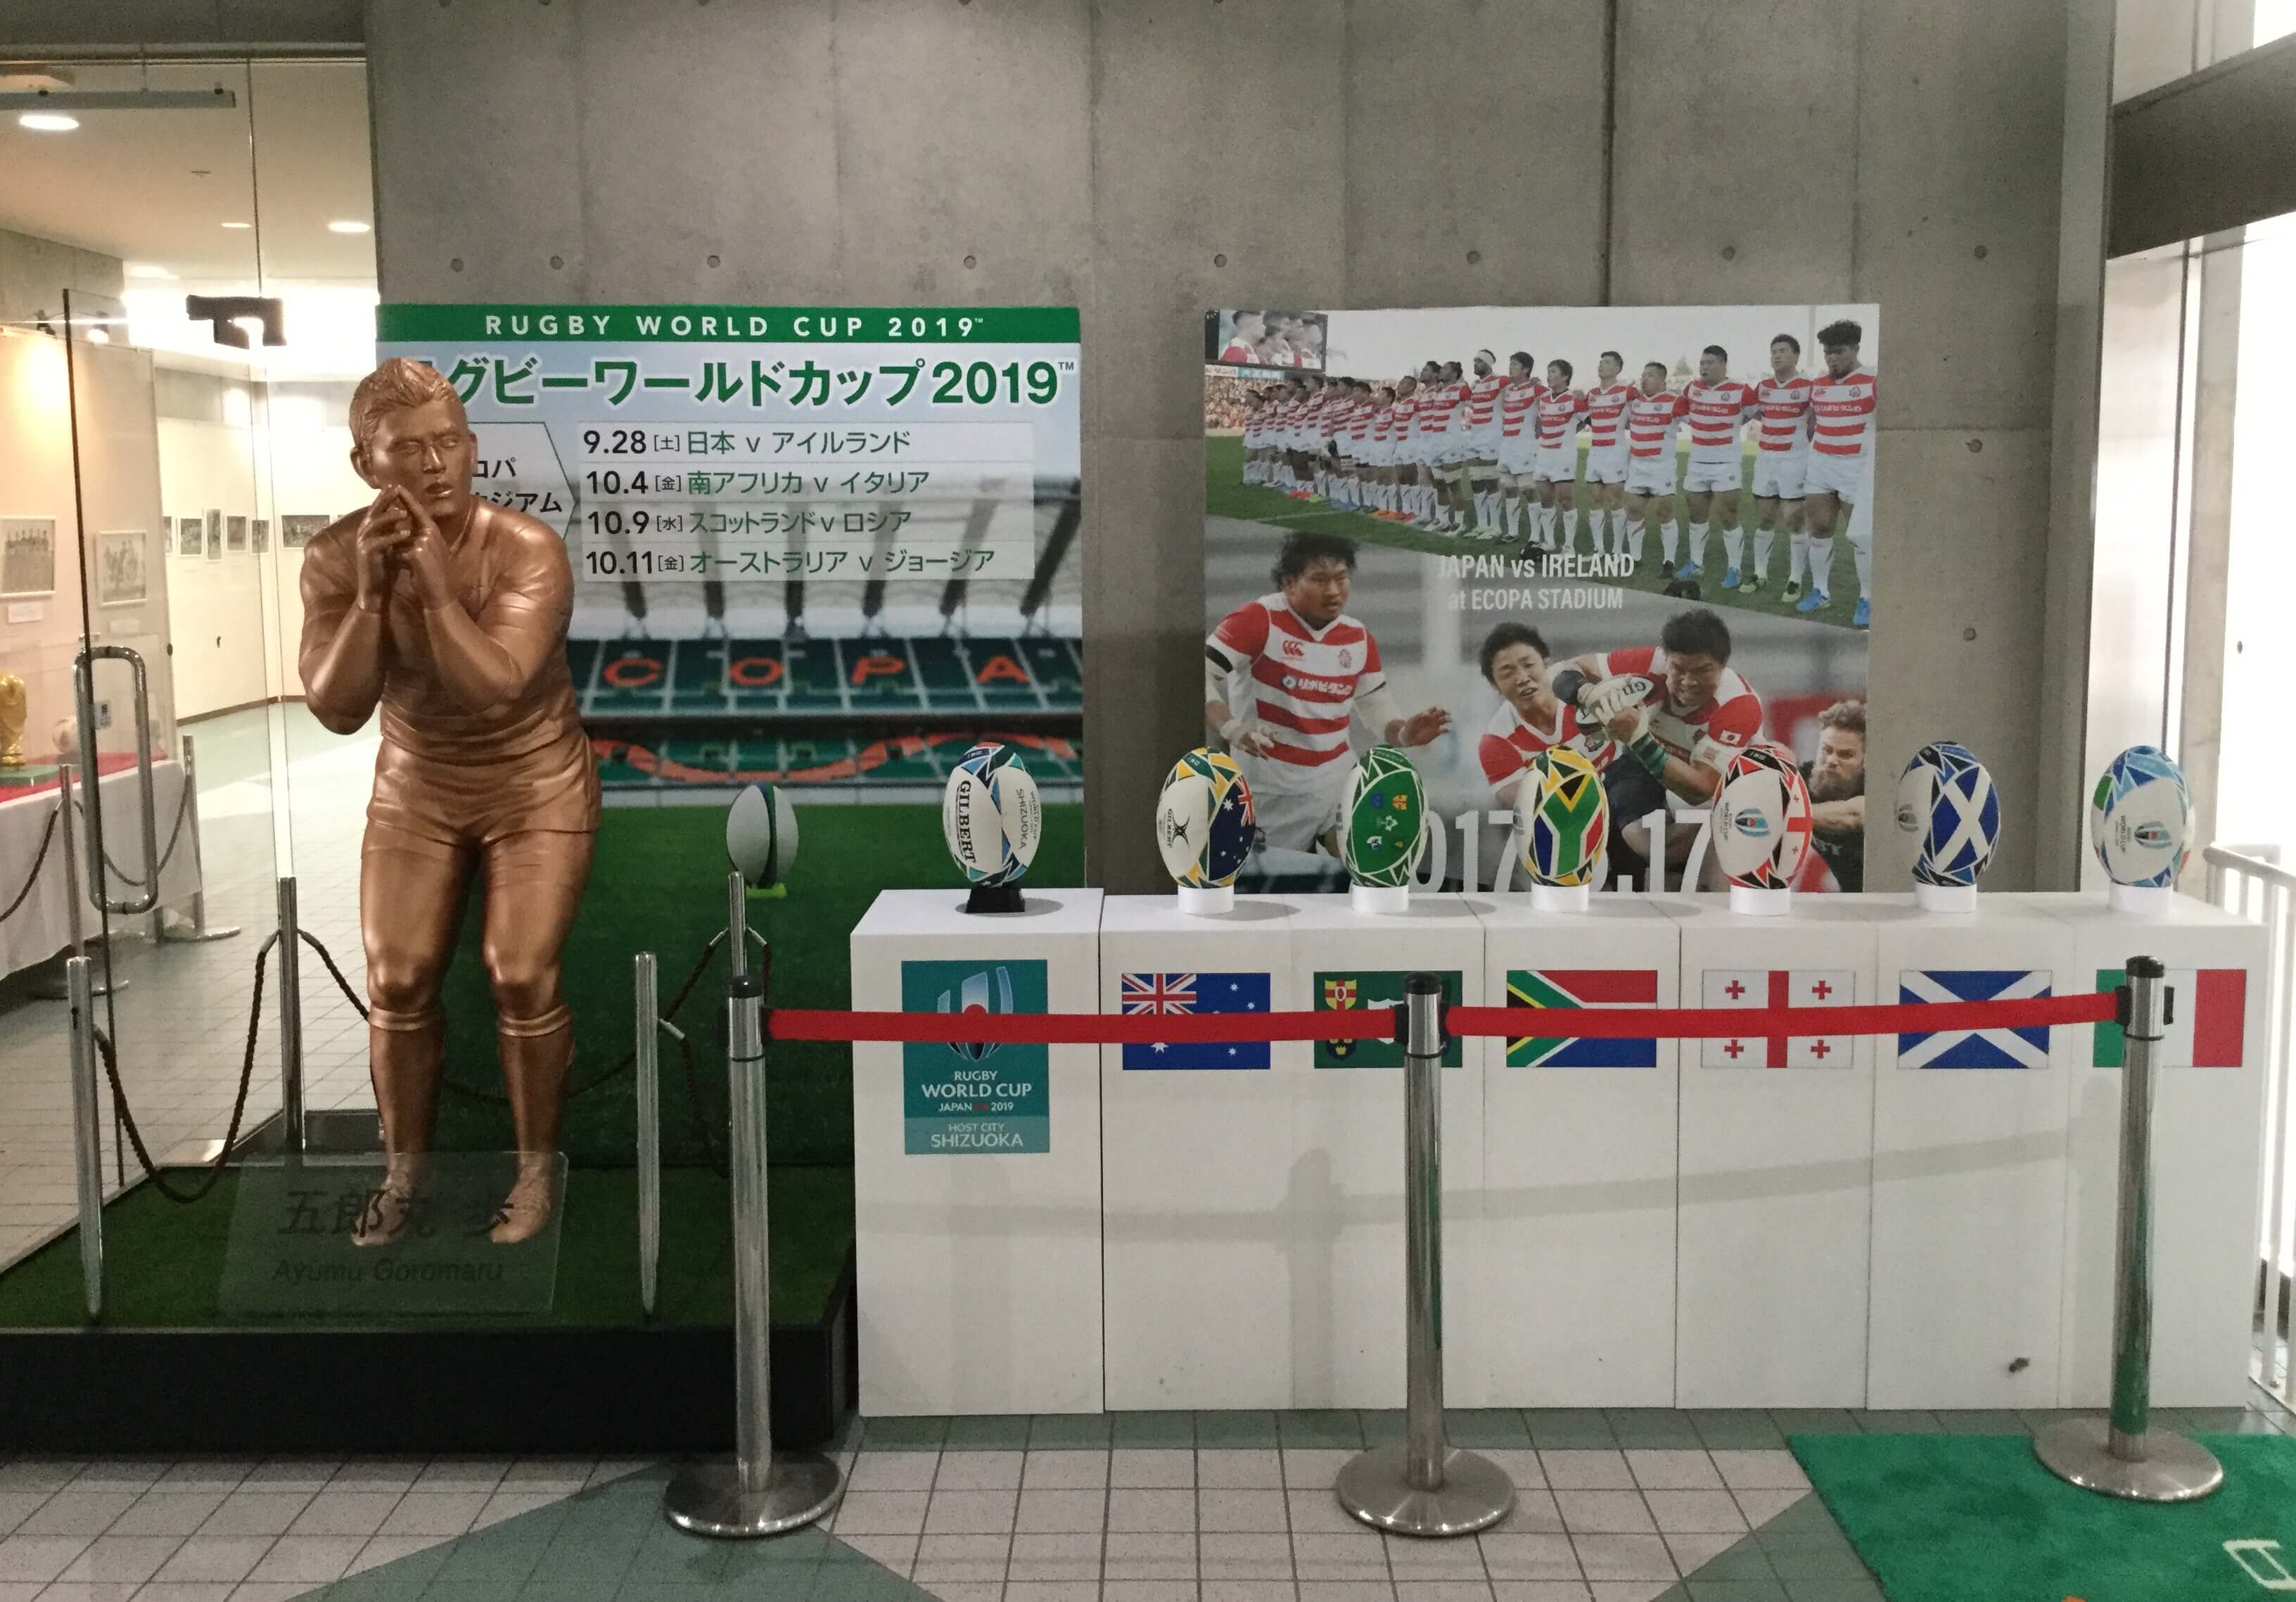 Statue of Ayumu Gomoramu at Shizuoka Ecopa Stadium